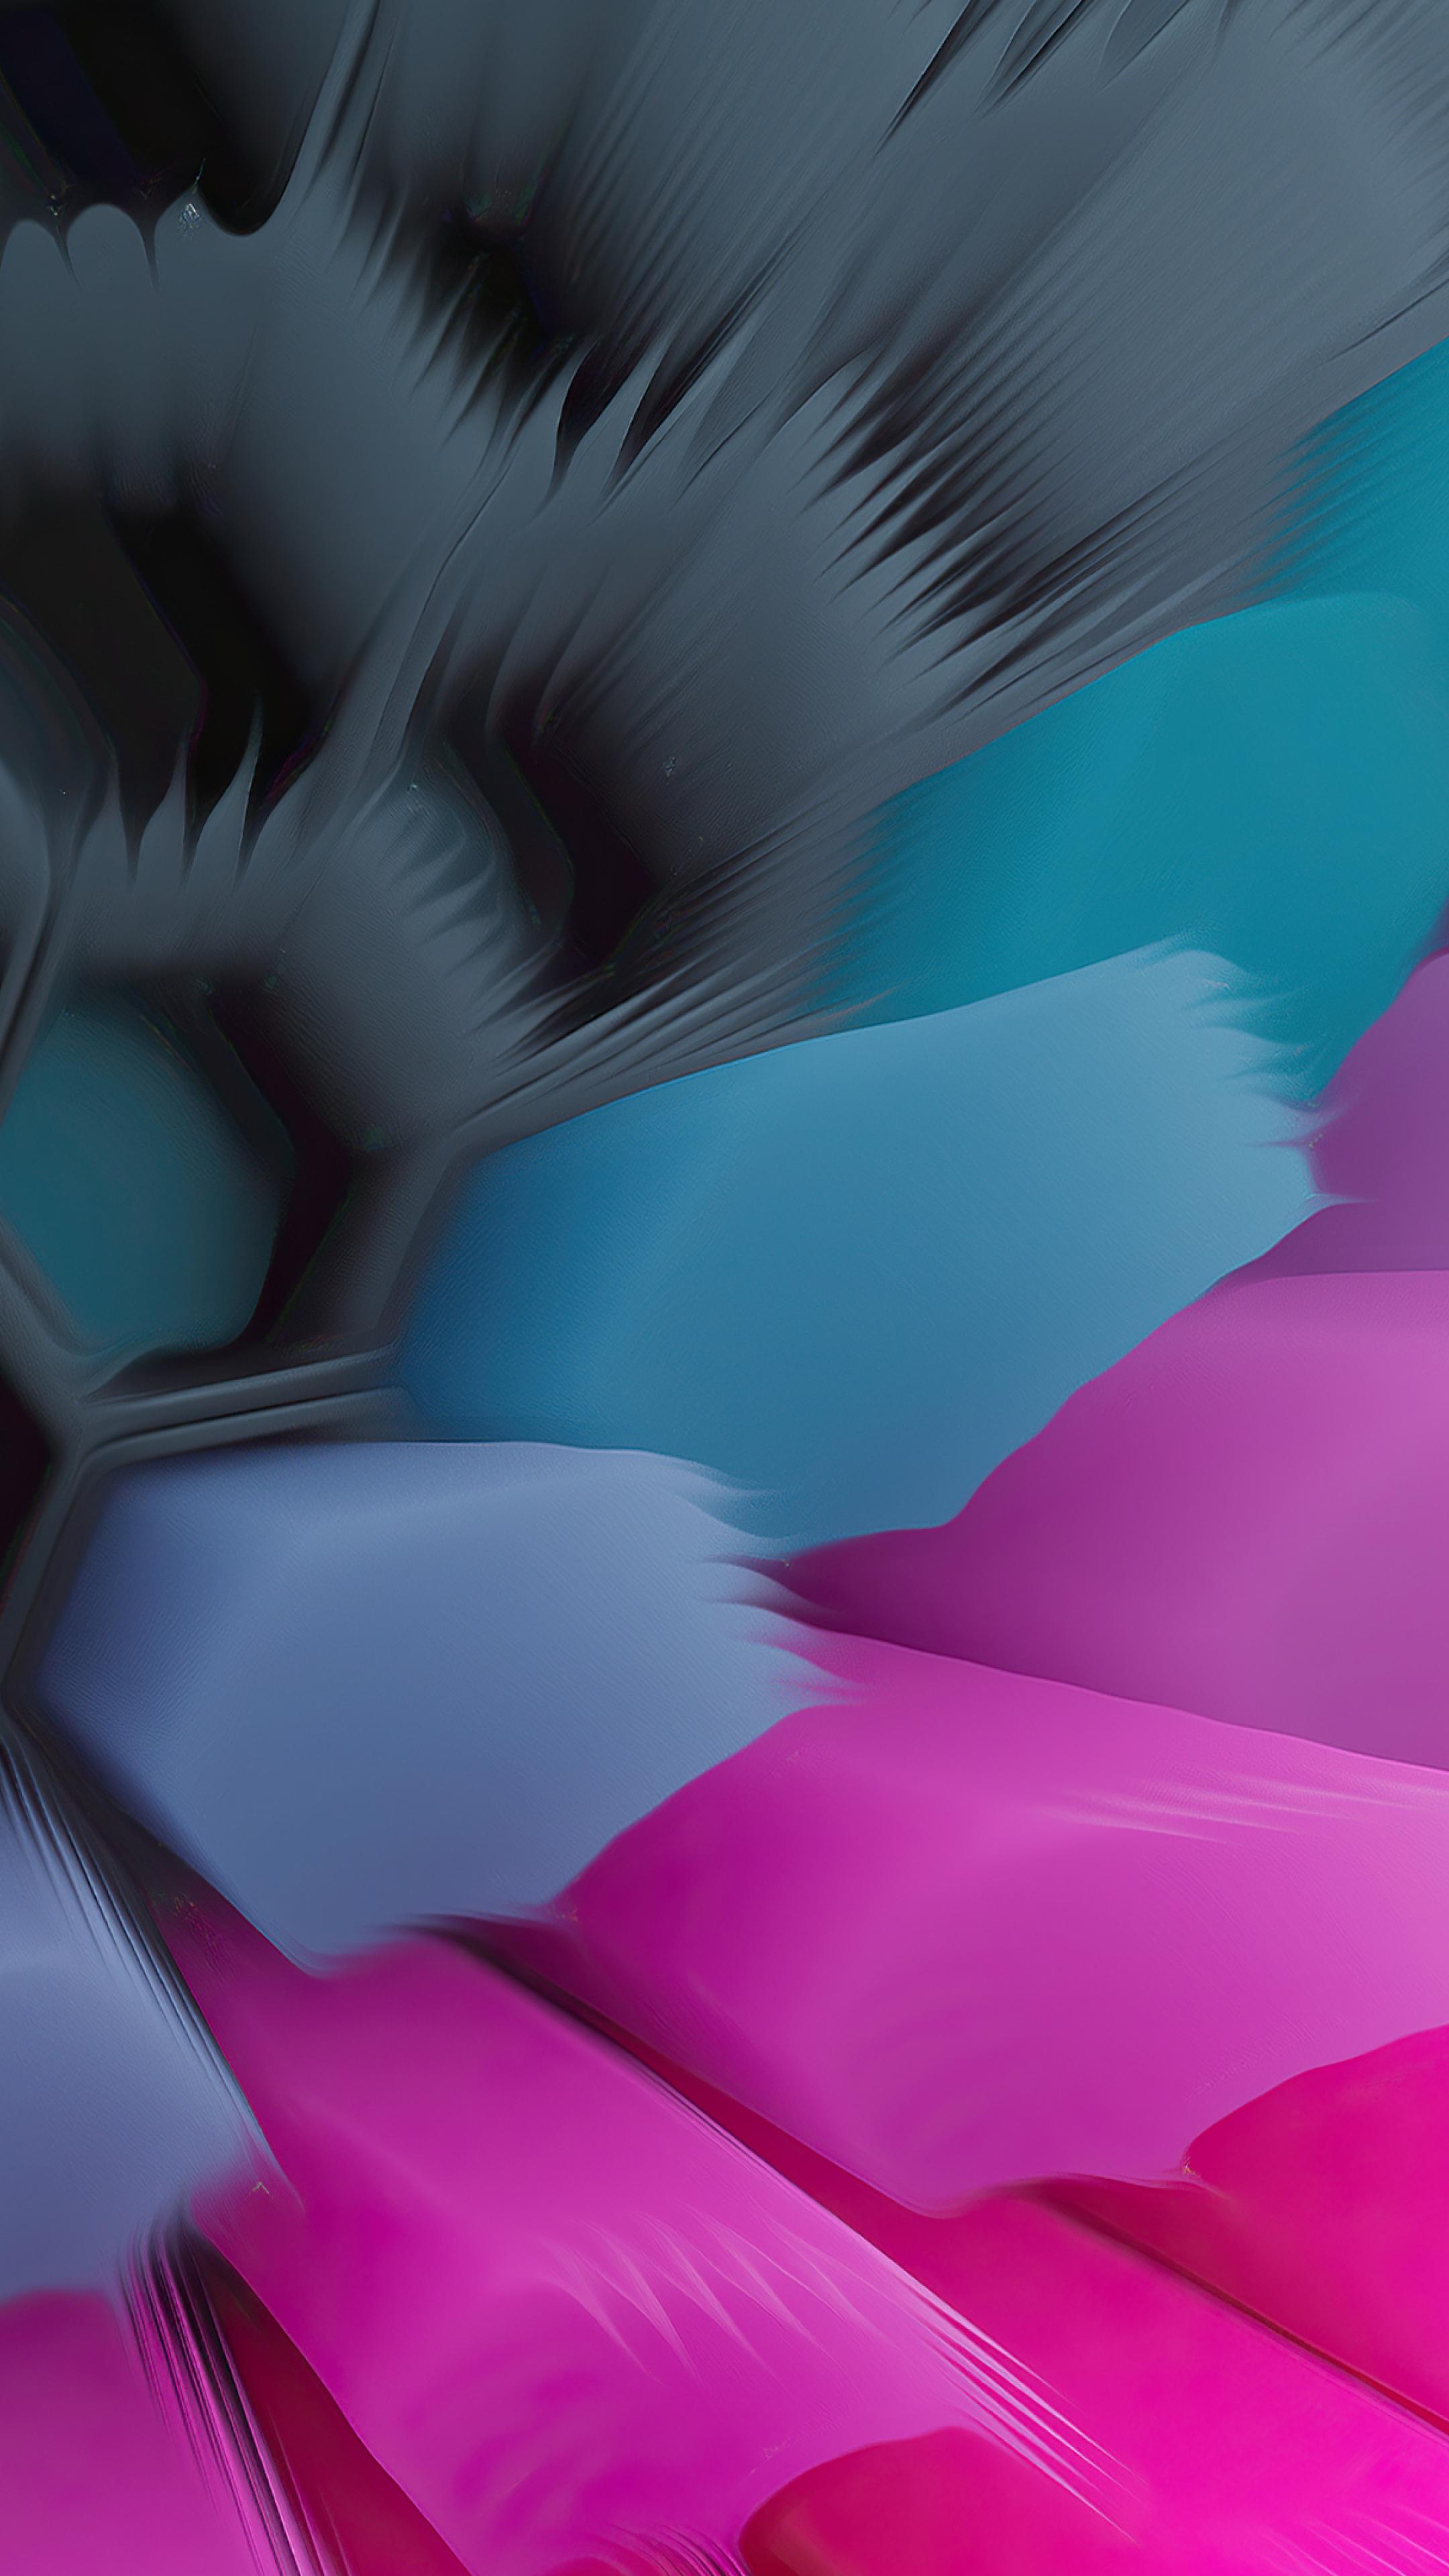 Pink Blue 4K Hexagon Wallpaper in 2160x3840 Resolution